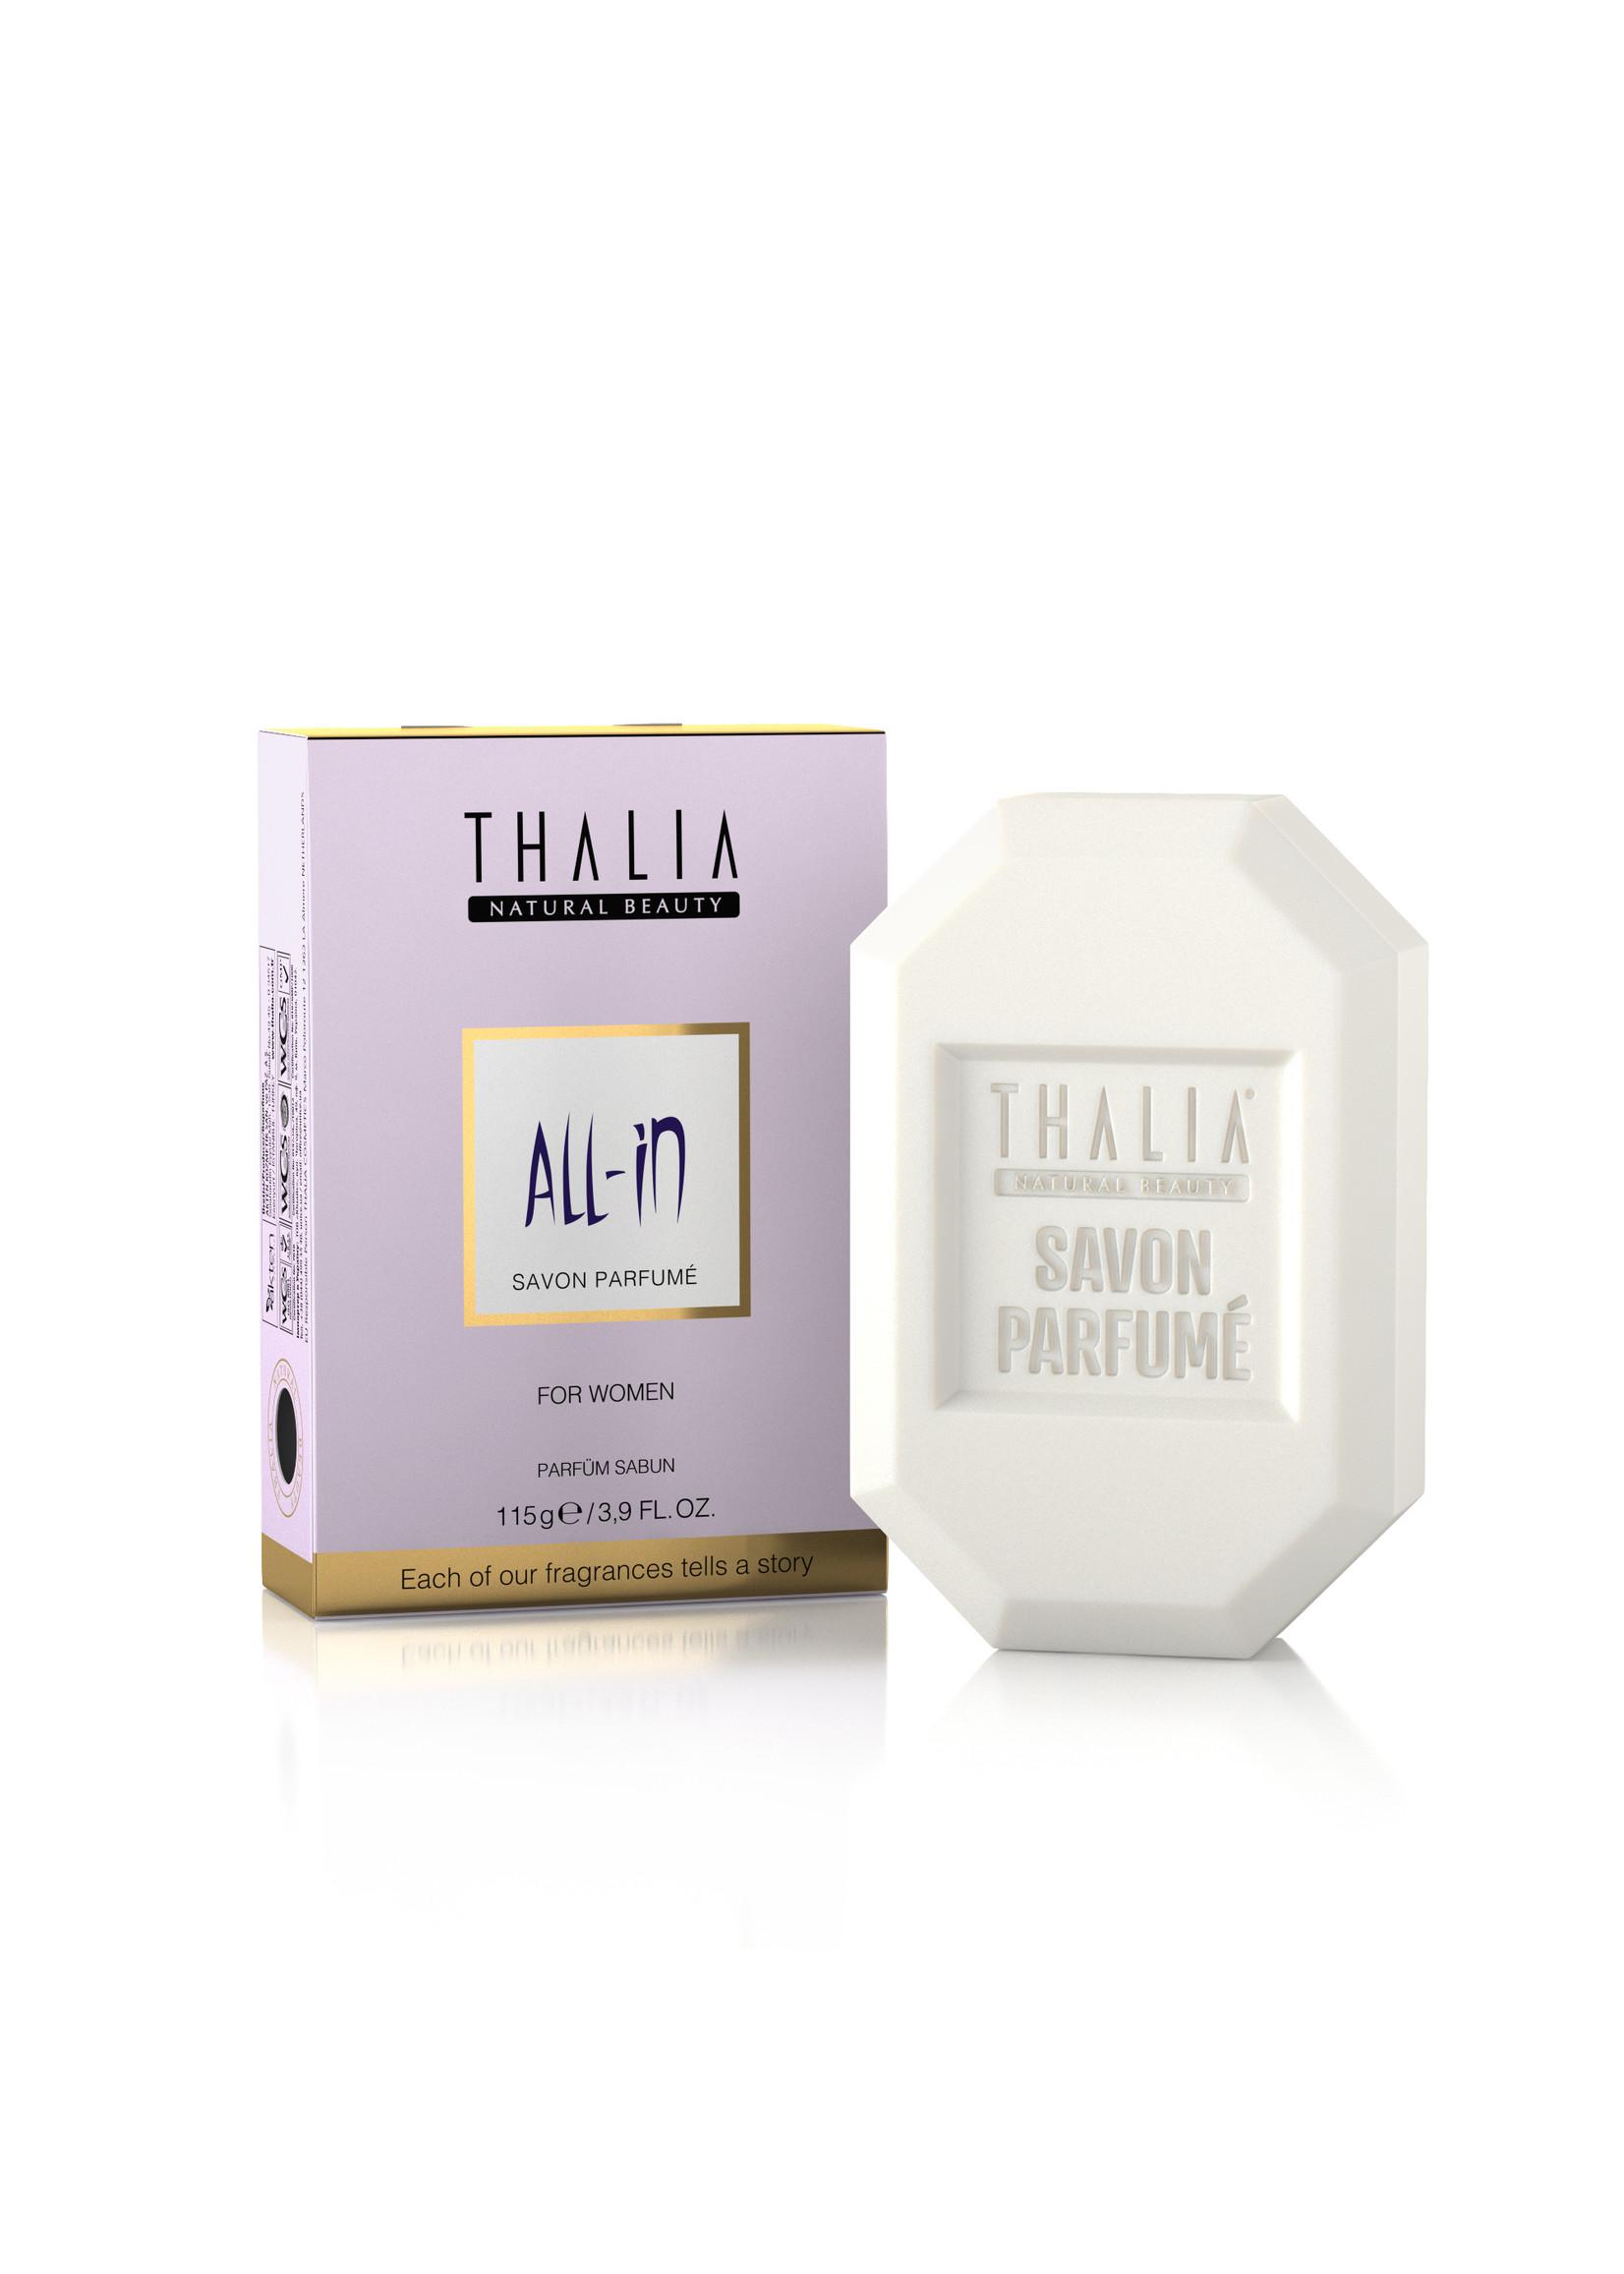 Thalia All-In Parfüm Sabun for Women - 115 gr.